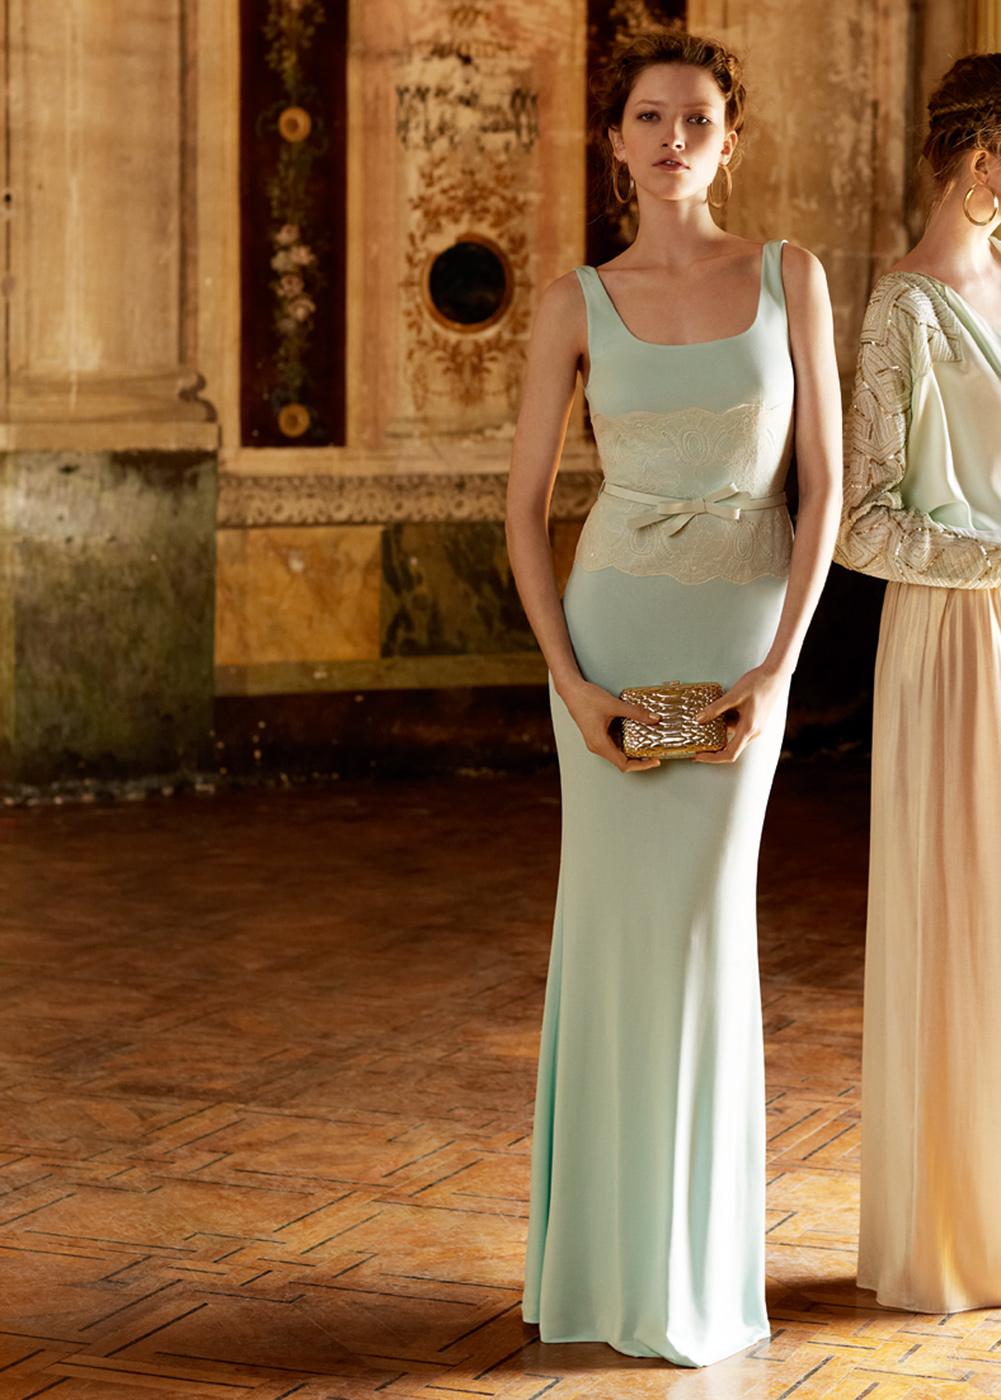 7b3b654aafc0 Εντυπωσιακά βραδινά Φορέματα MANGO 2012- Νέα Συλλογή Ceremony ...